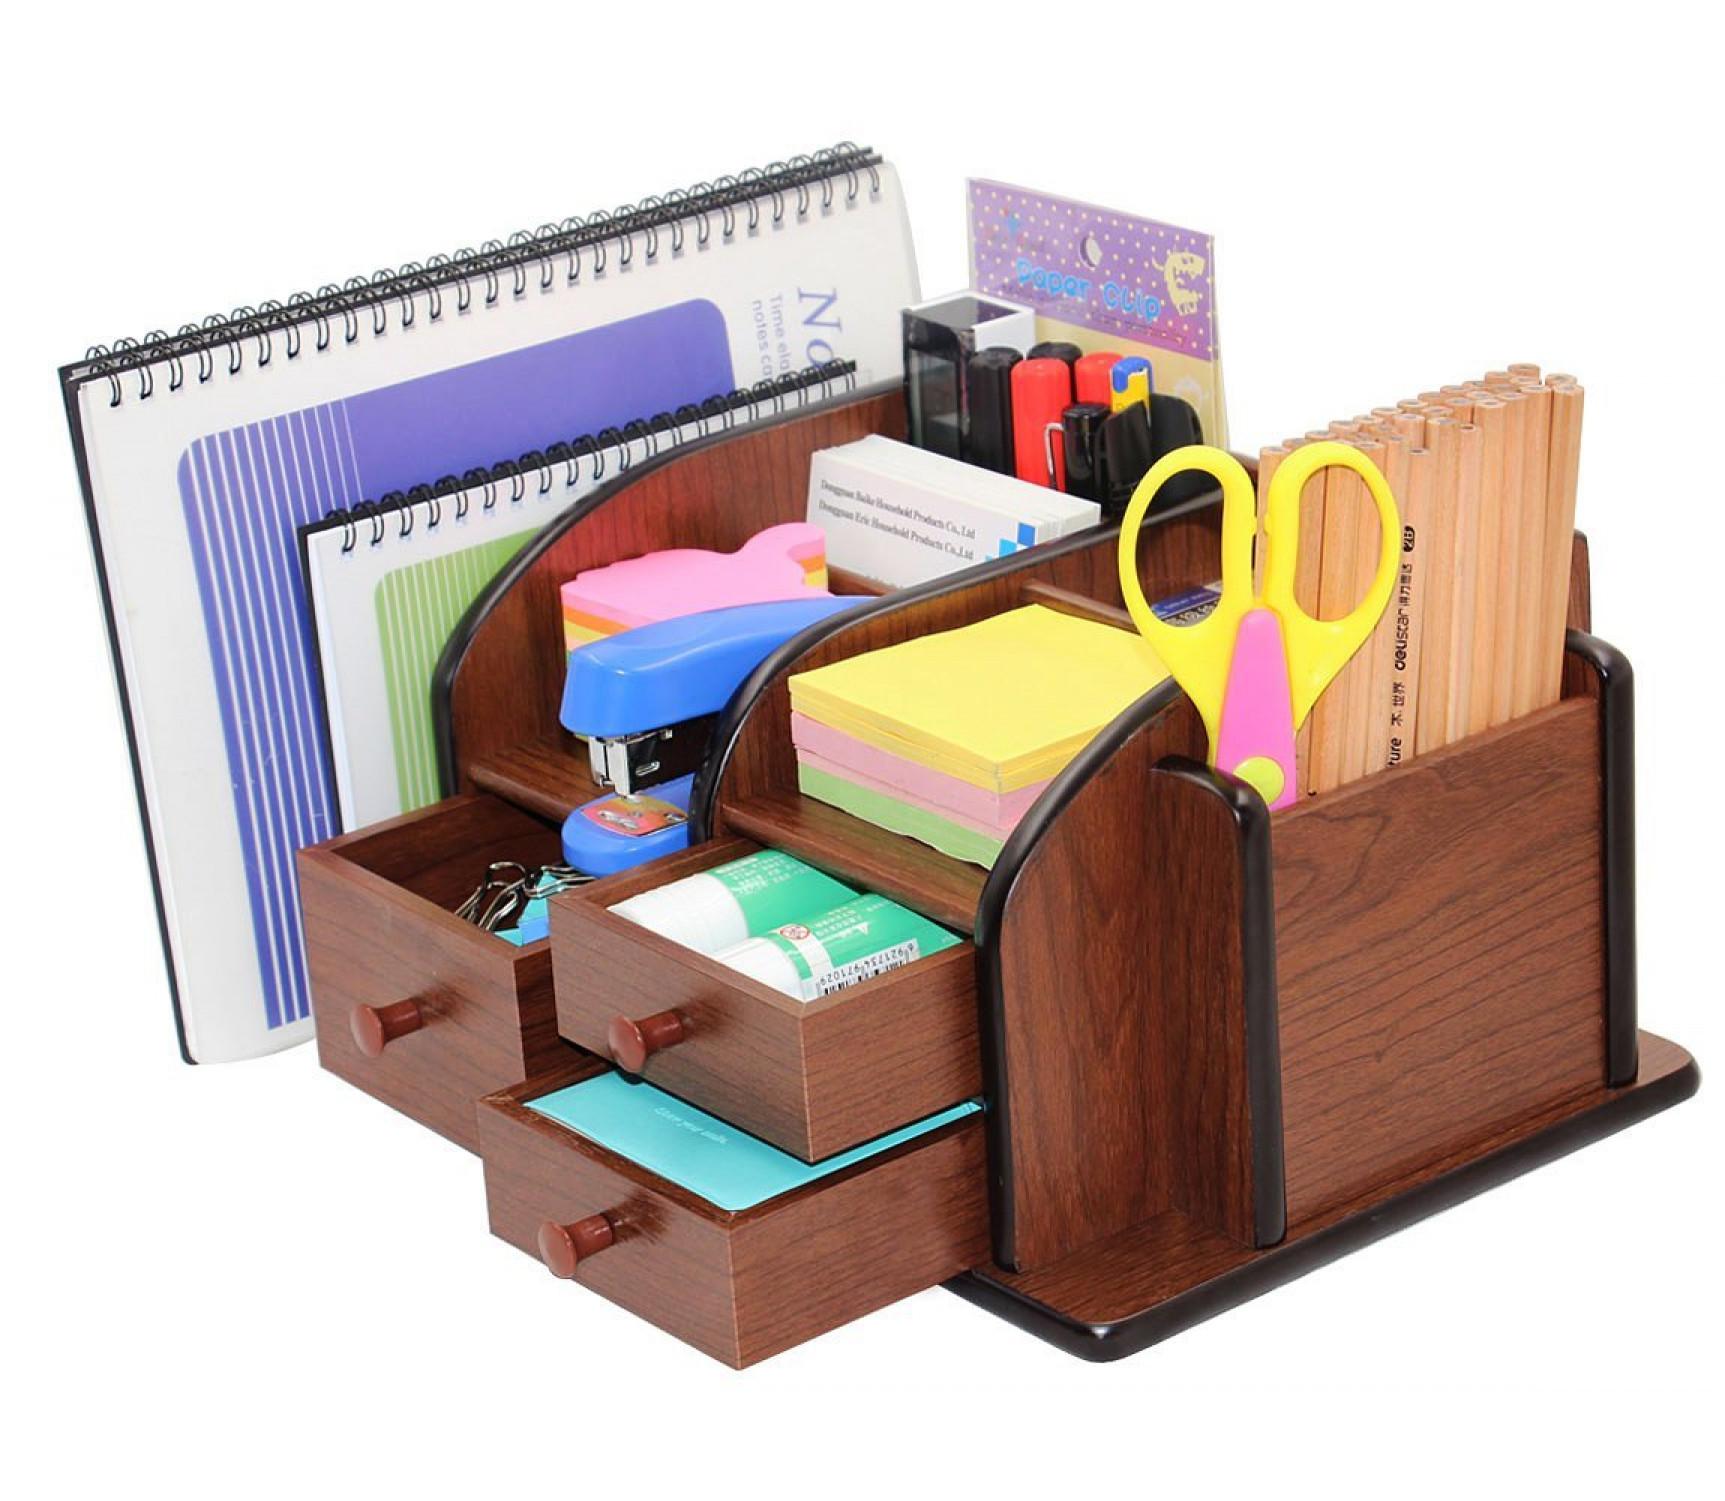 Image Is Loading Wooden Desk Organizer Office Supplies Accessories Storage  Drawer